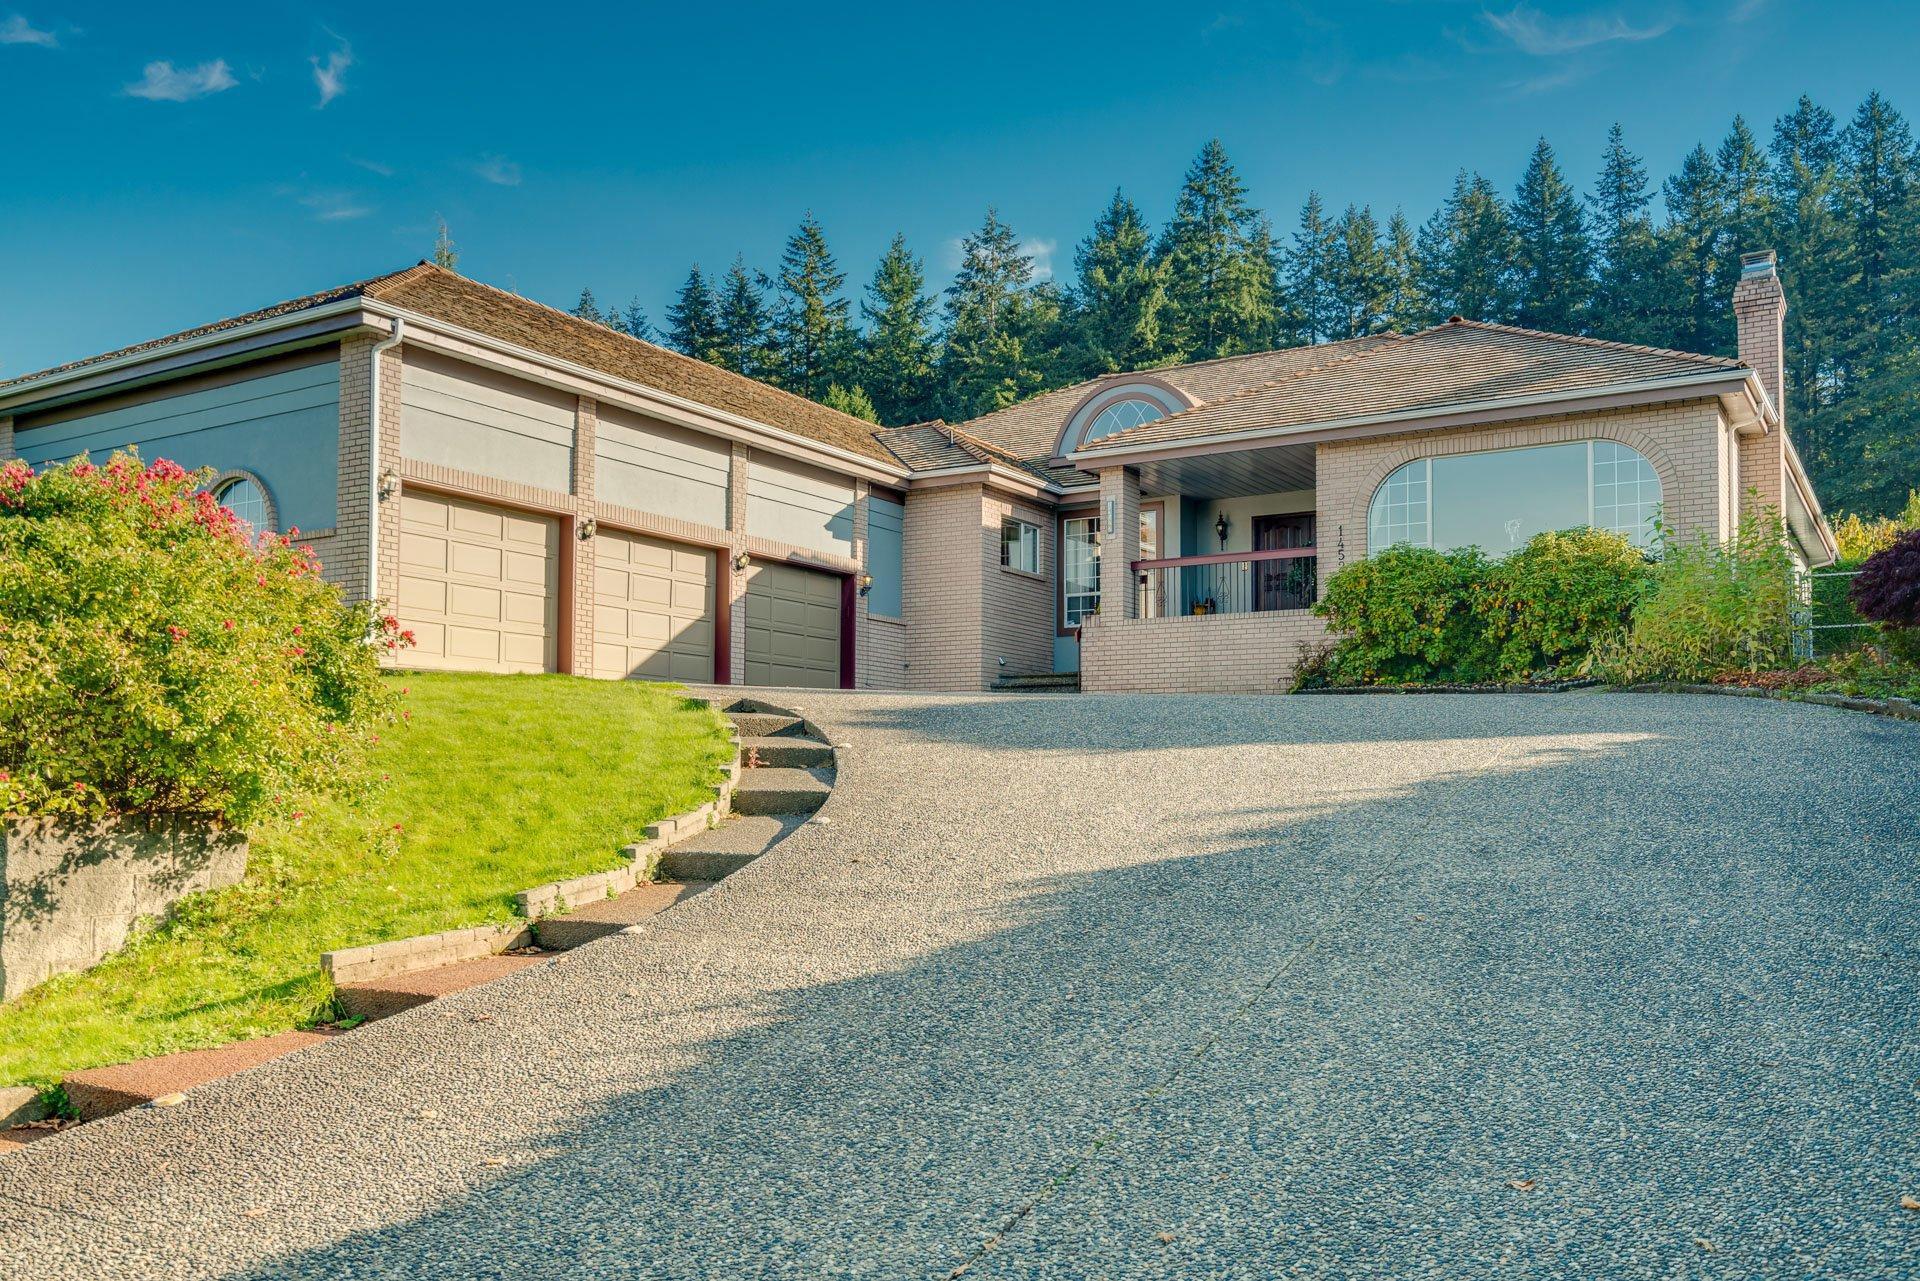 "Main Photo: 14522 29 Avenue in Surrey: Elgin Chantrell House for sale in ""ELGIN CHANTRELL"" (South Surrey White Rock)  : MLS®# R2314832"